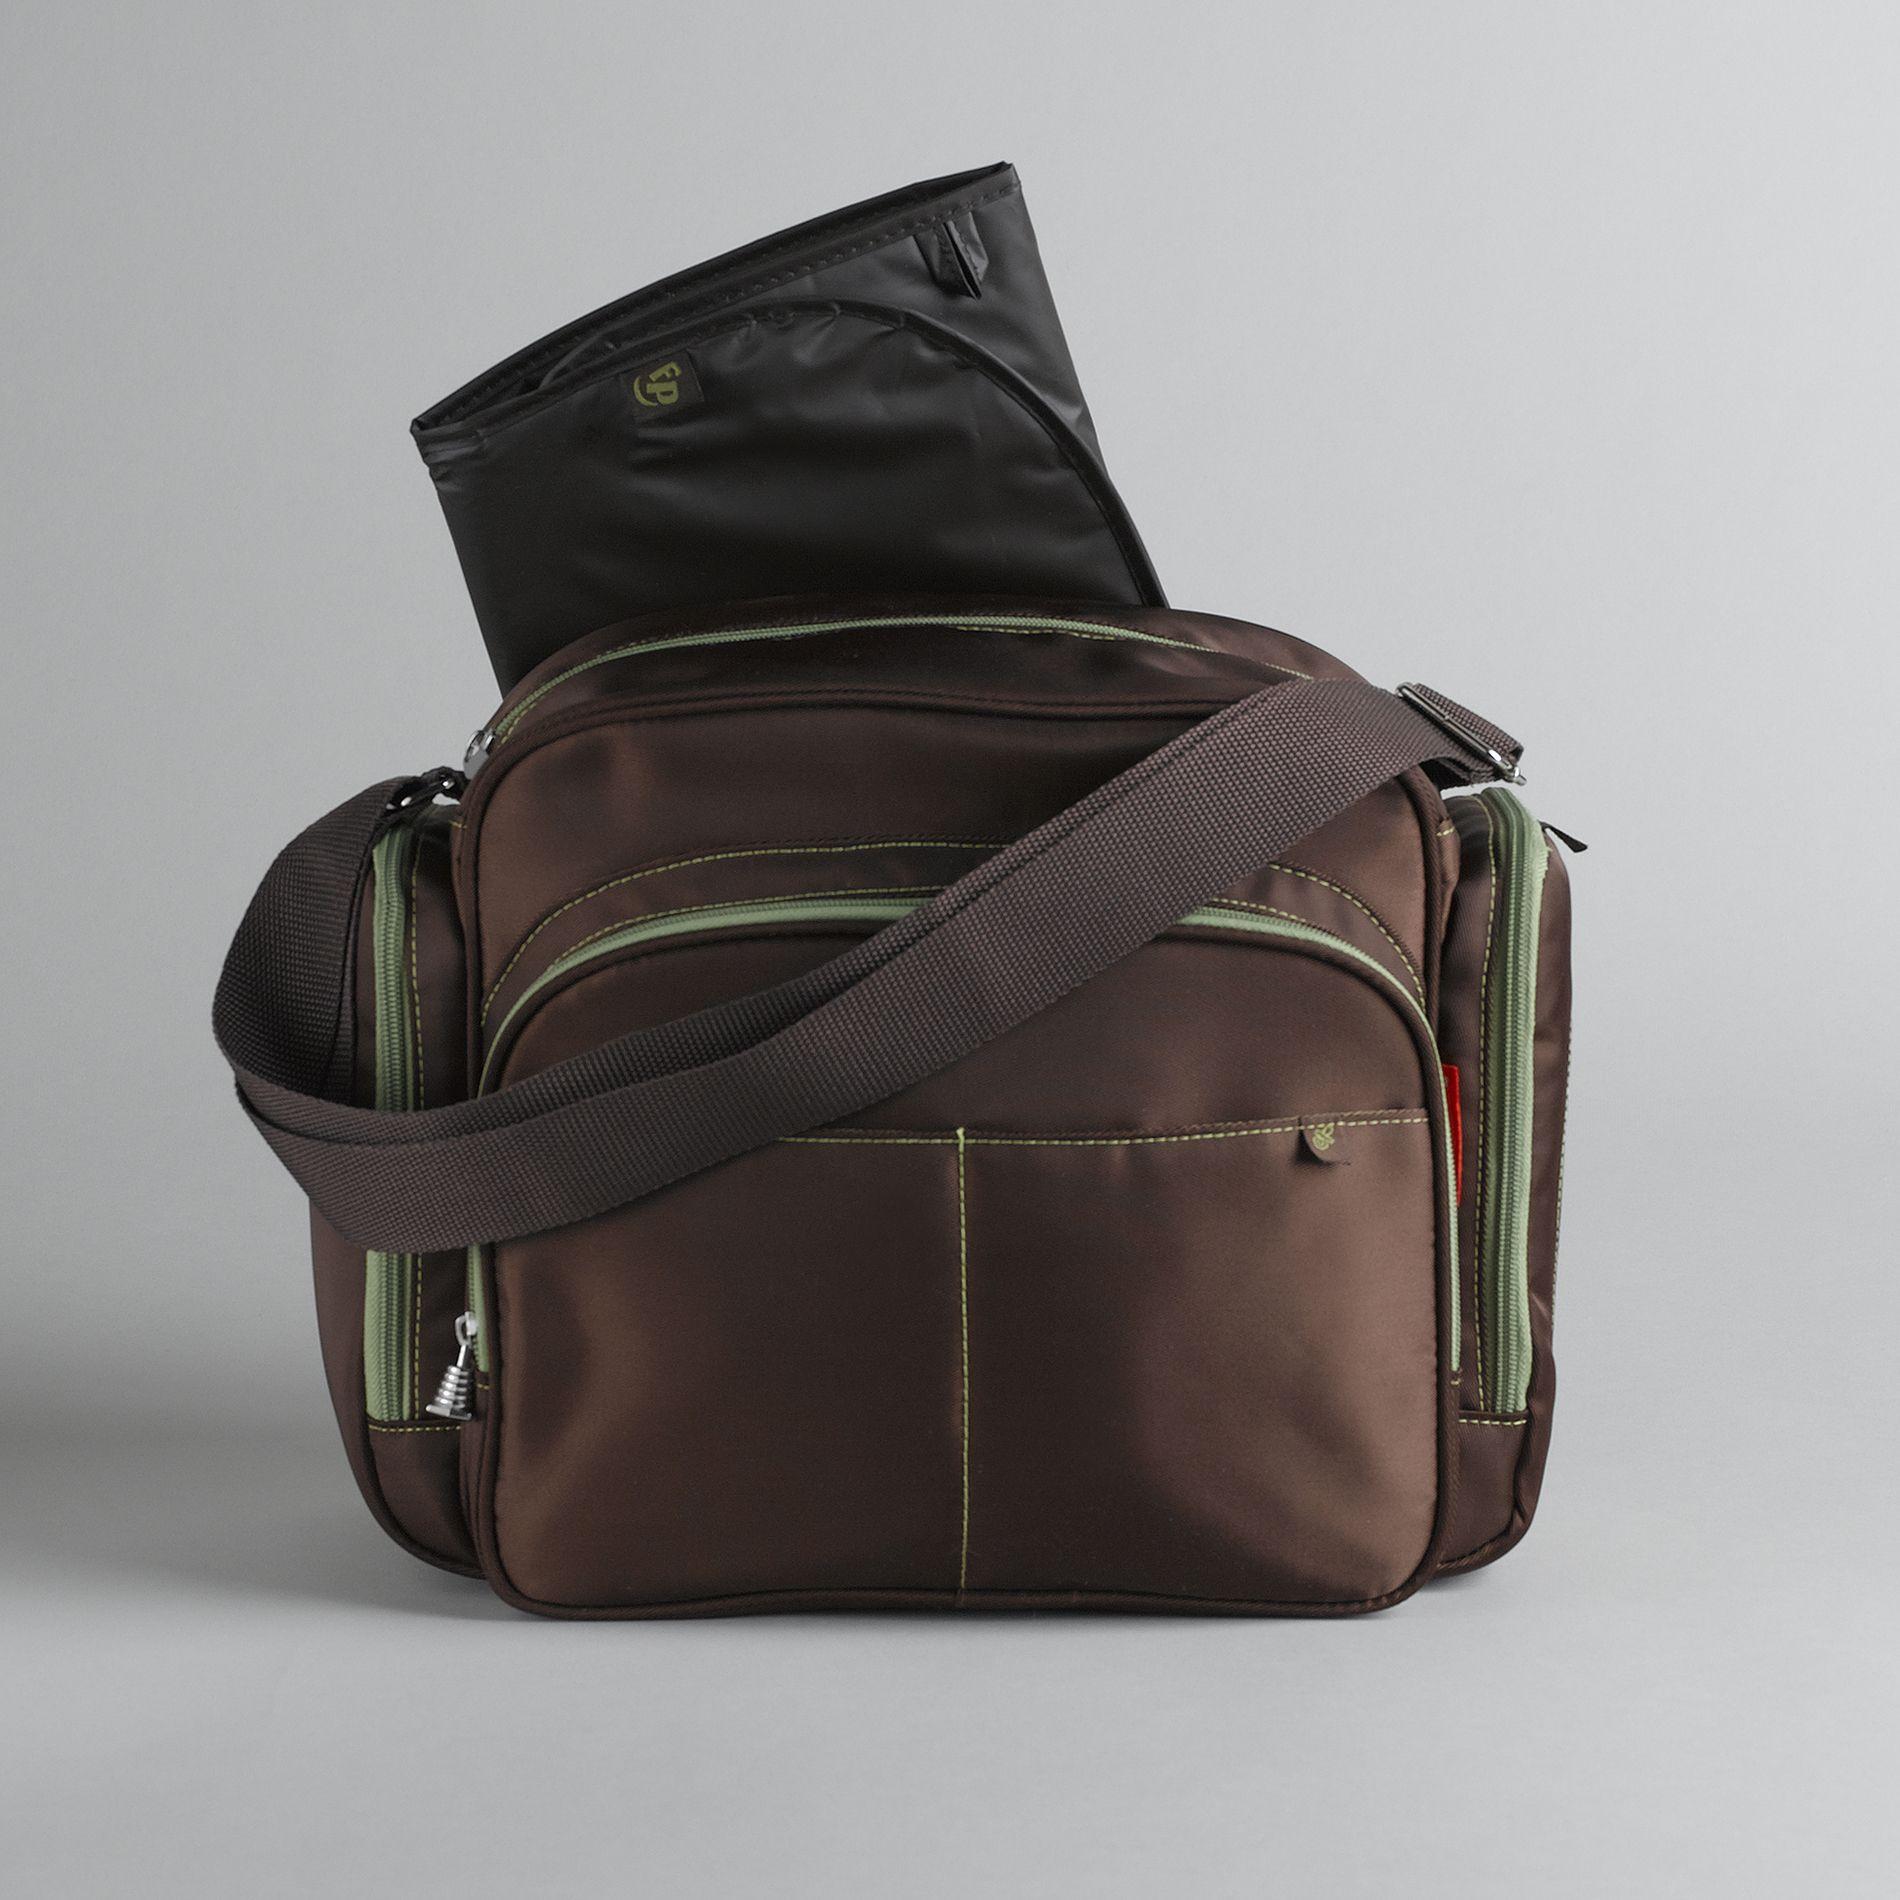 Fisher-Price Fast Finder Diaper Bag